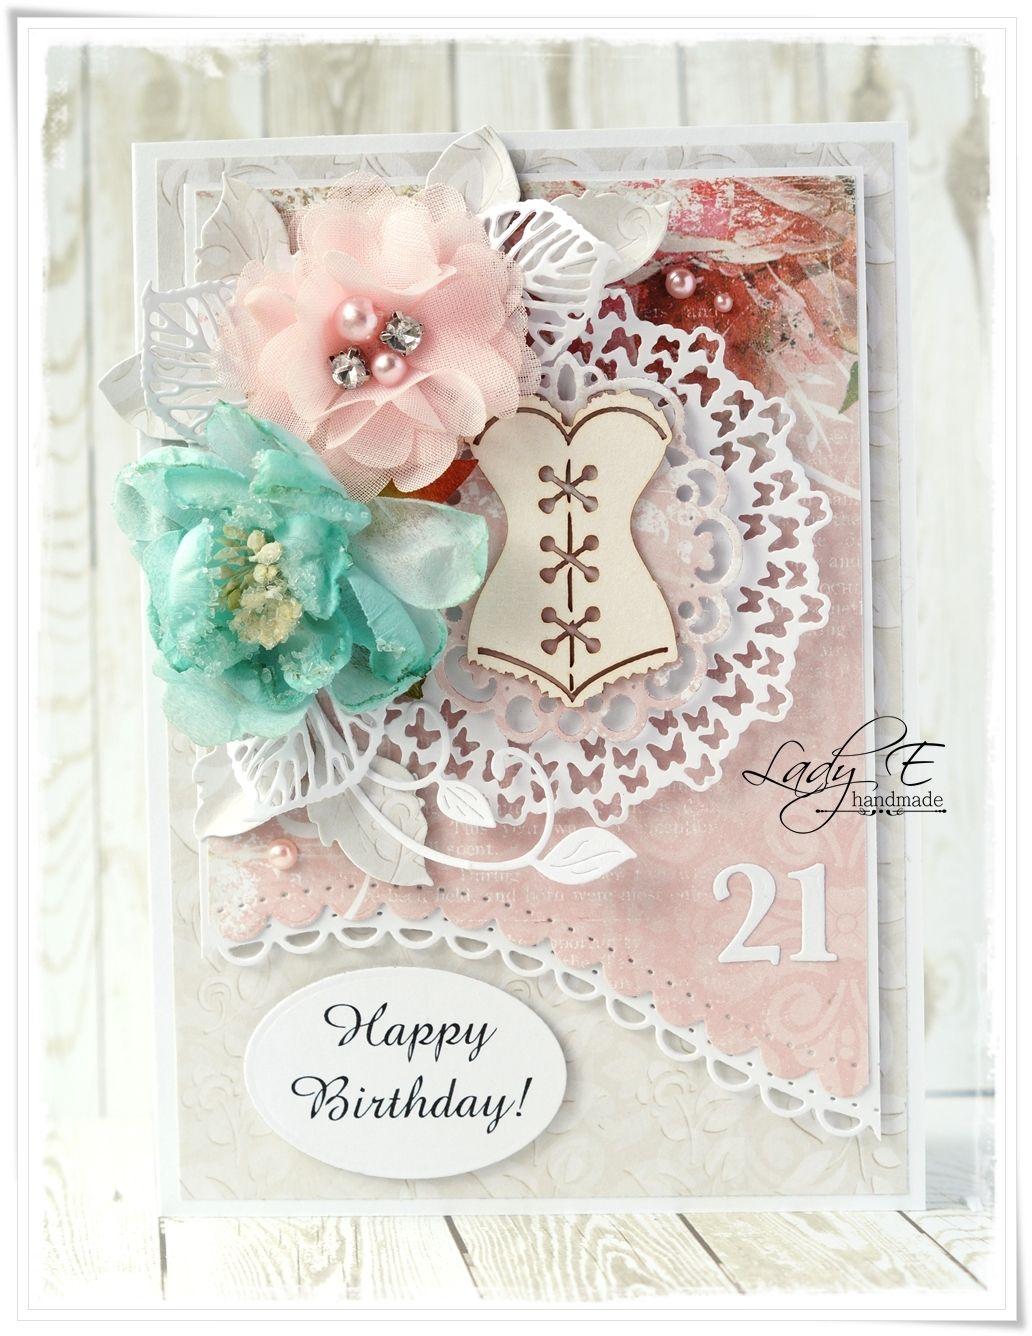 Scrap Art By Lady E 21st Birthday Cards For The Magazine Kartki